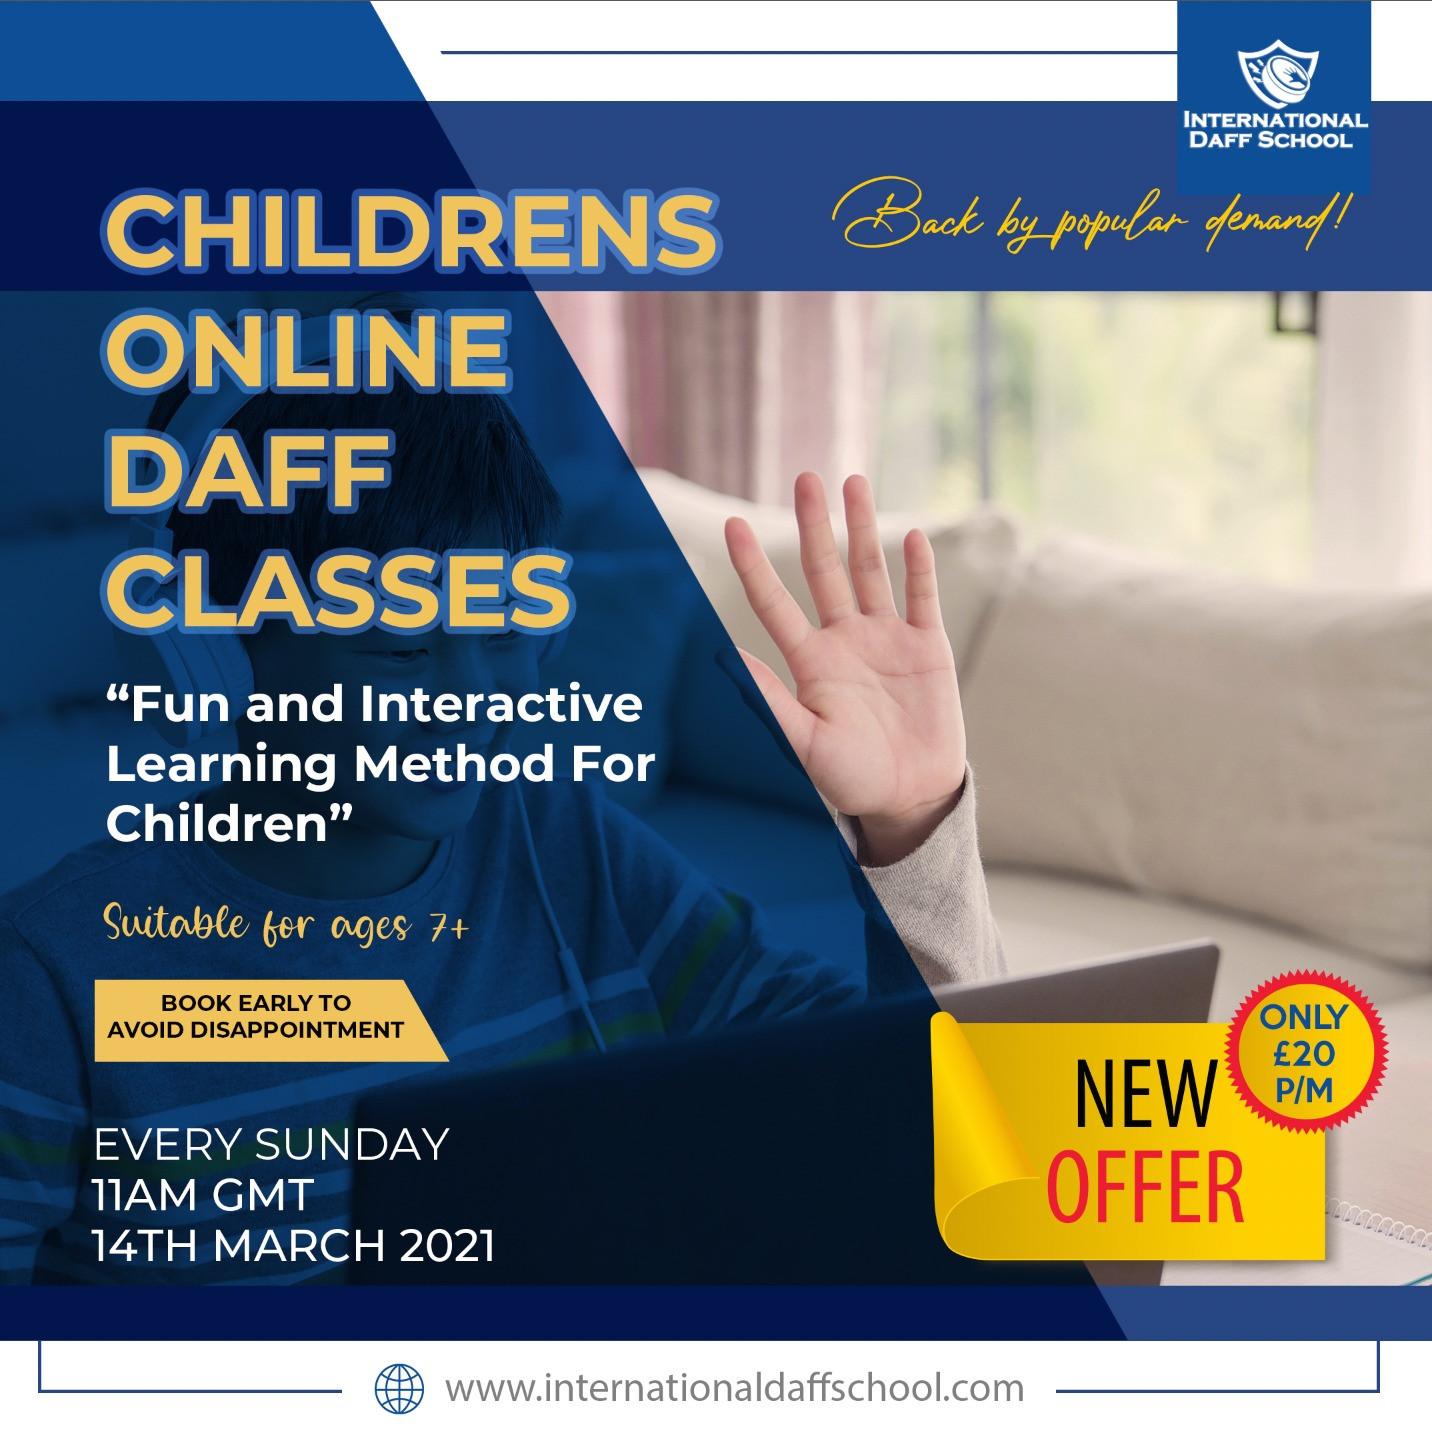 Children's Online Daff Classes